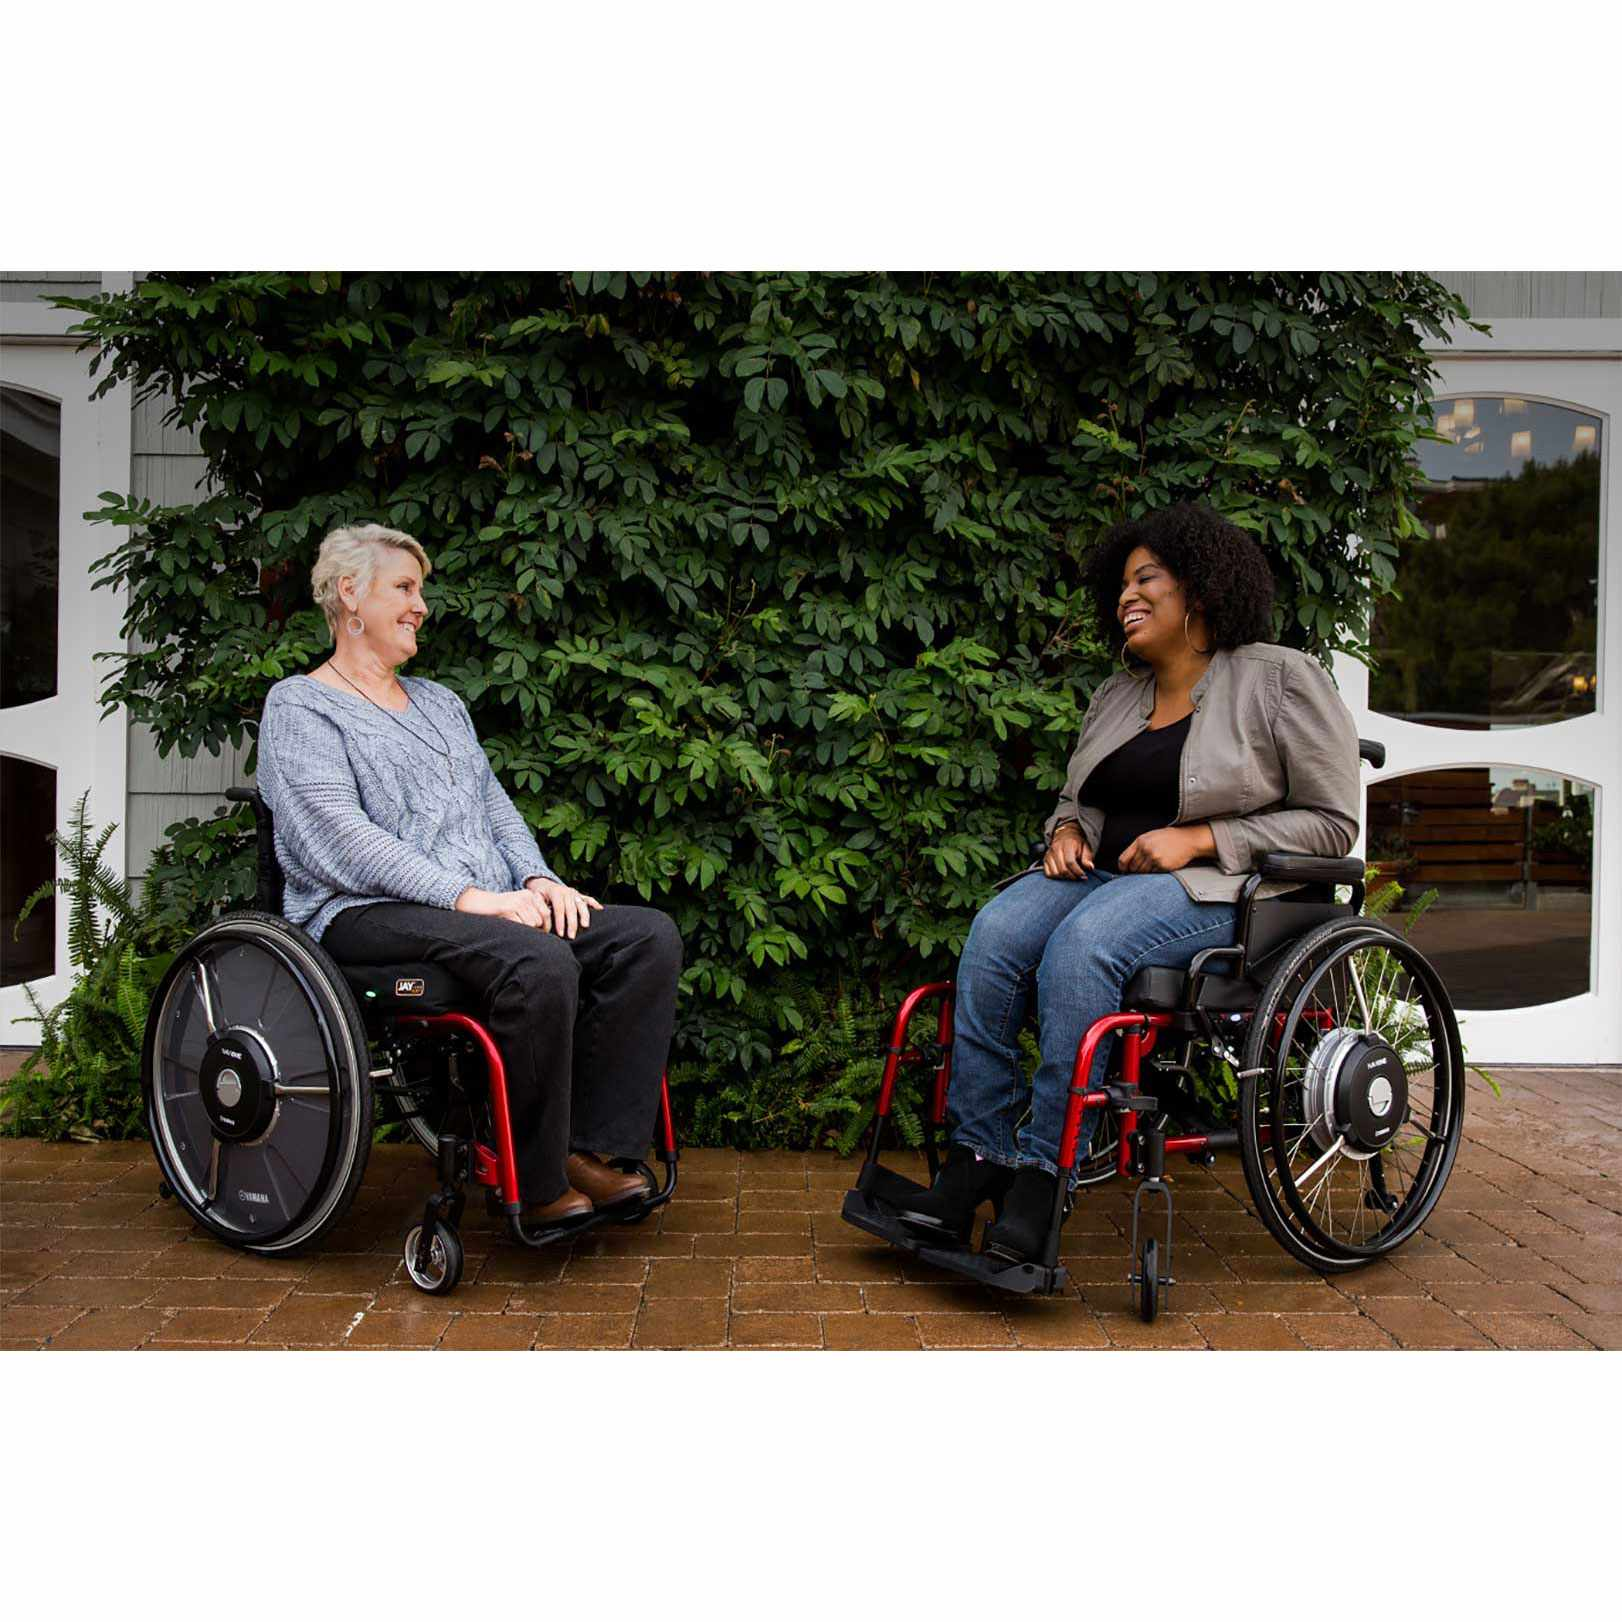 NaviOne Power Assist Wheelchair System